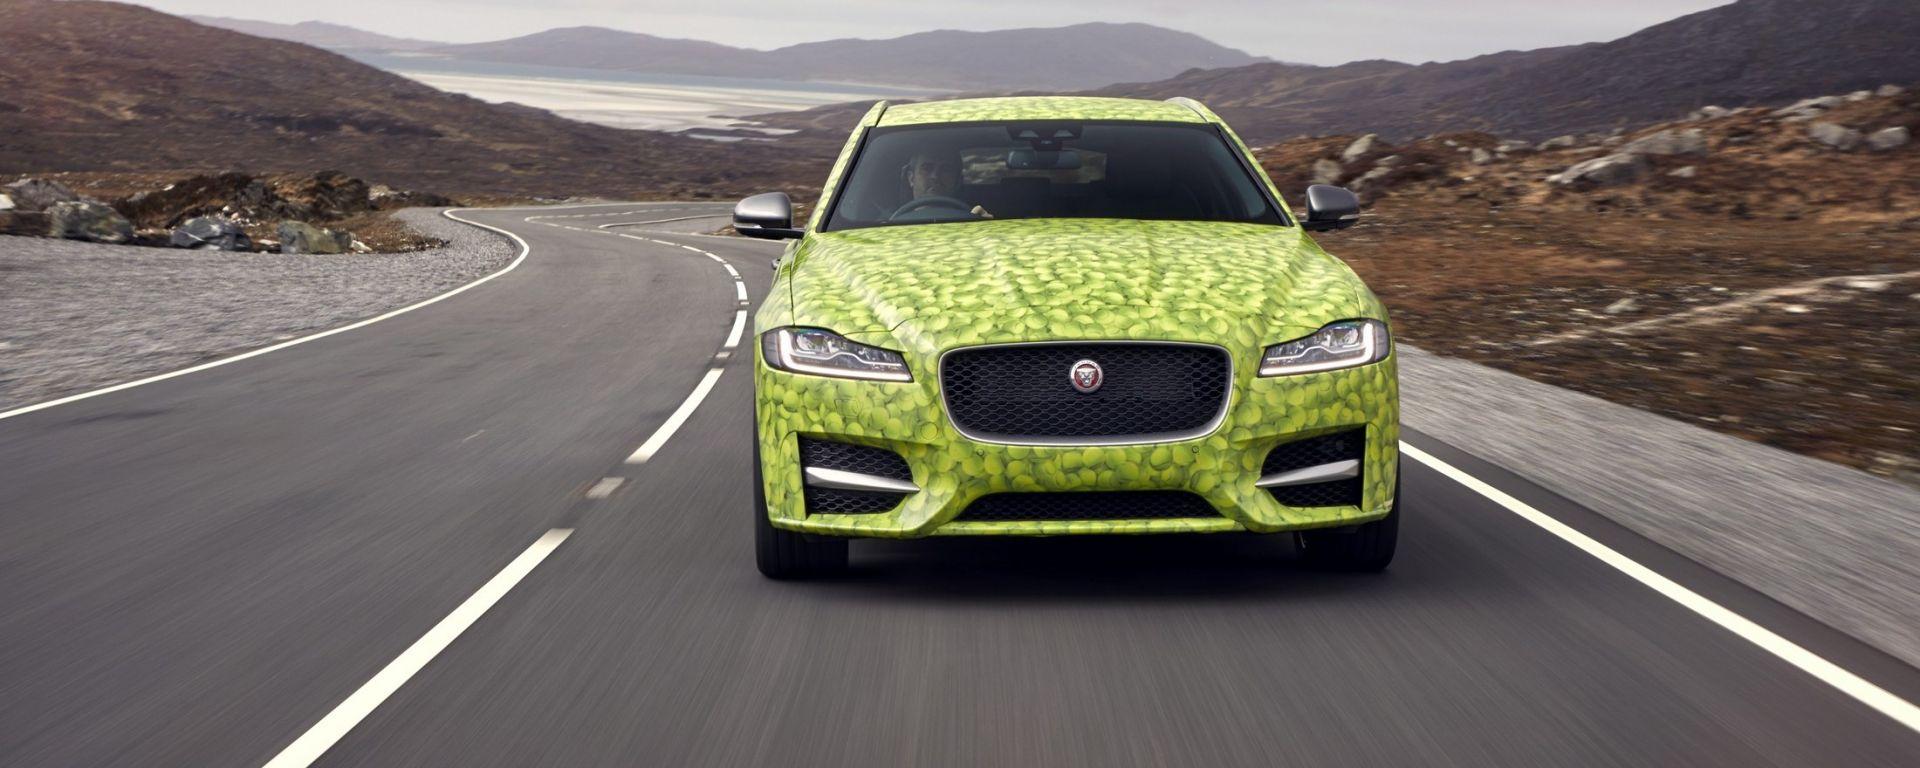 Nuova Jaguar XF Sportbrake: la nuova immagine teaser